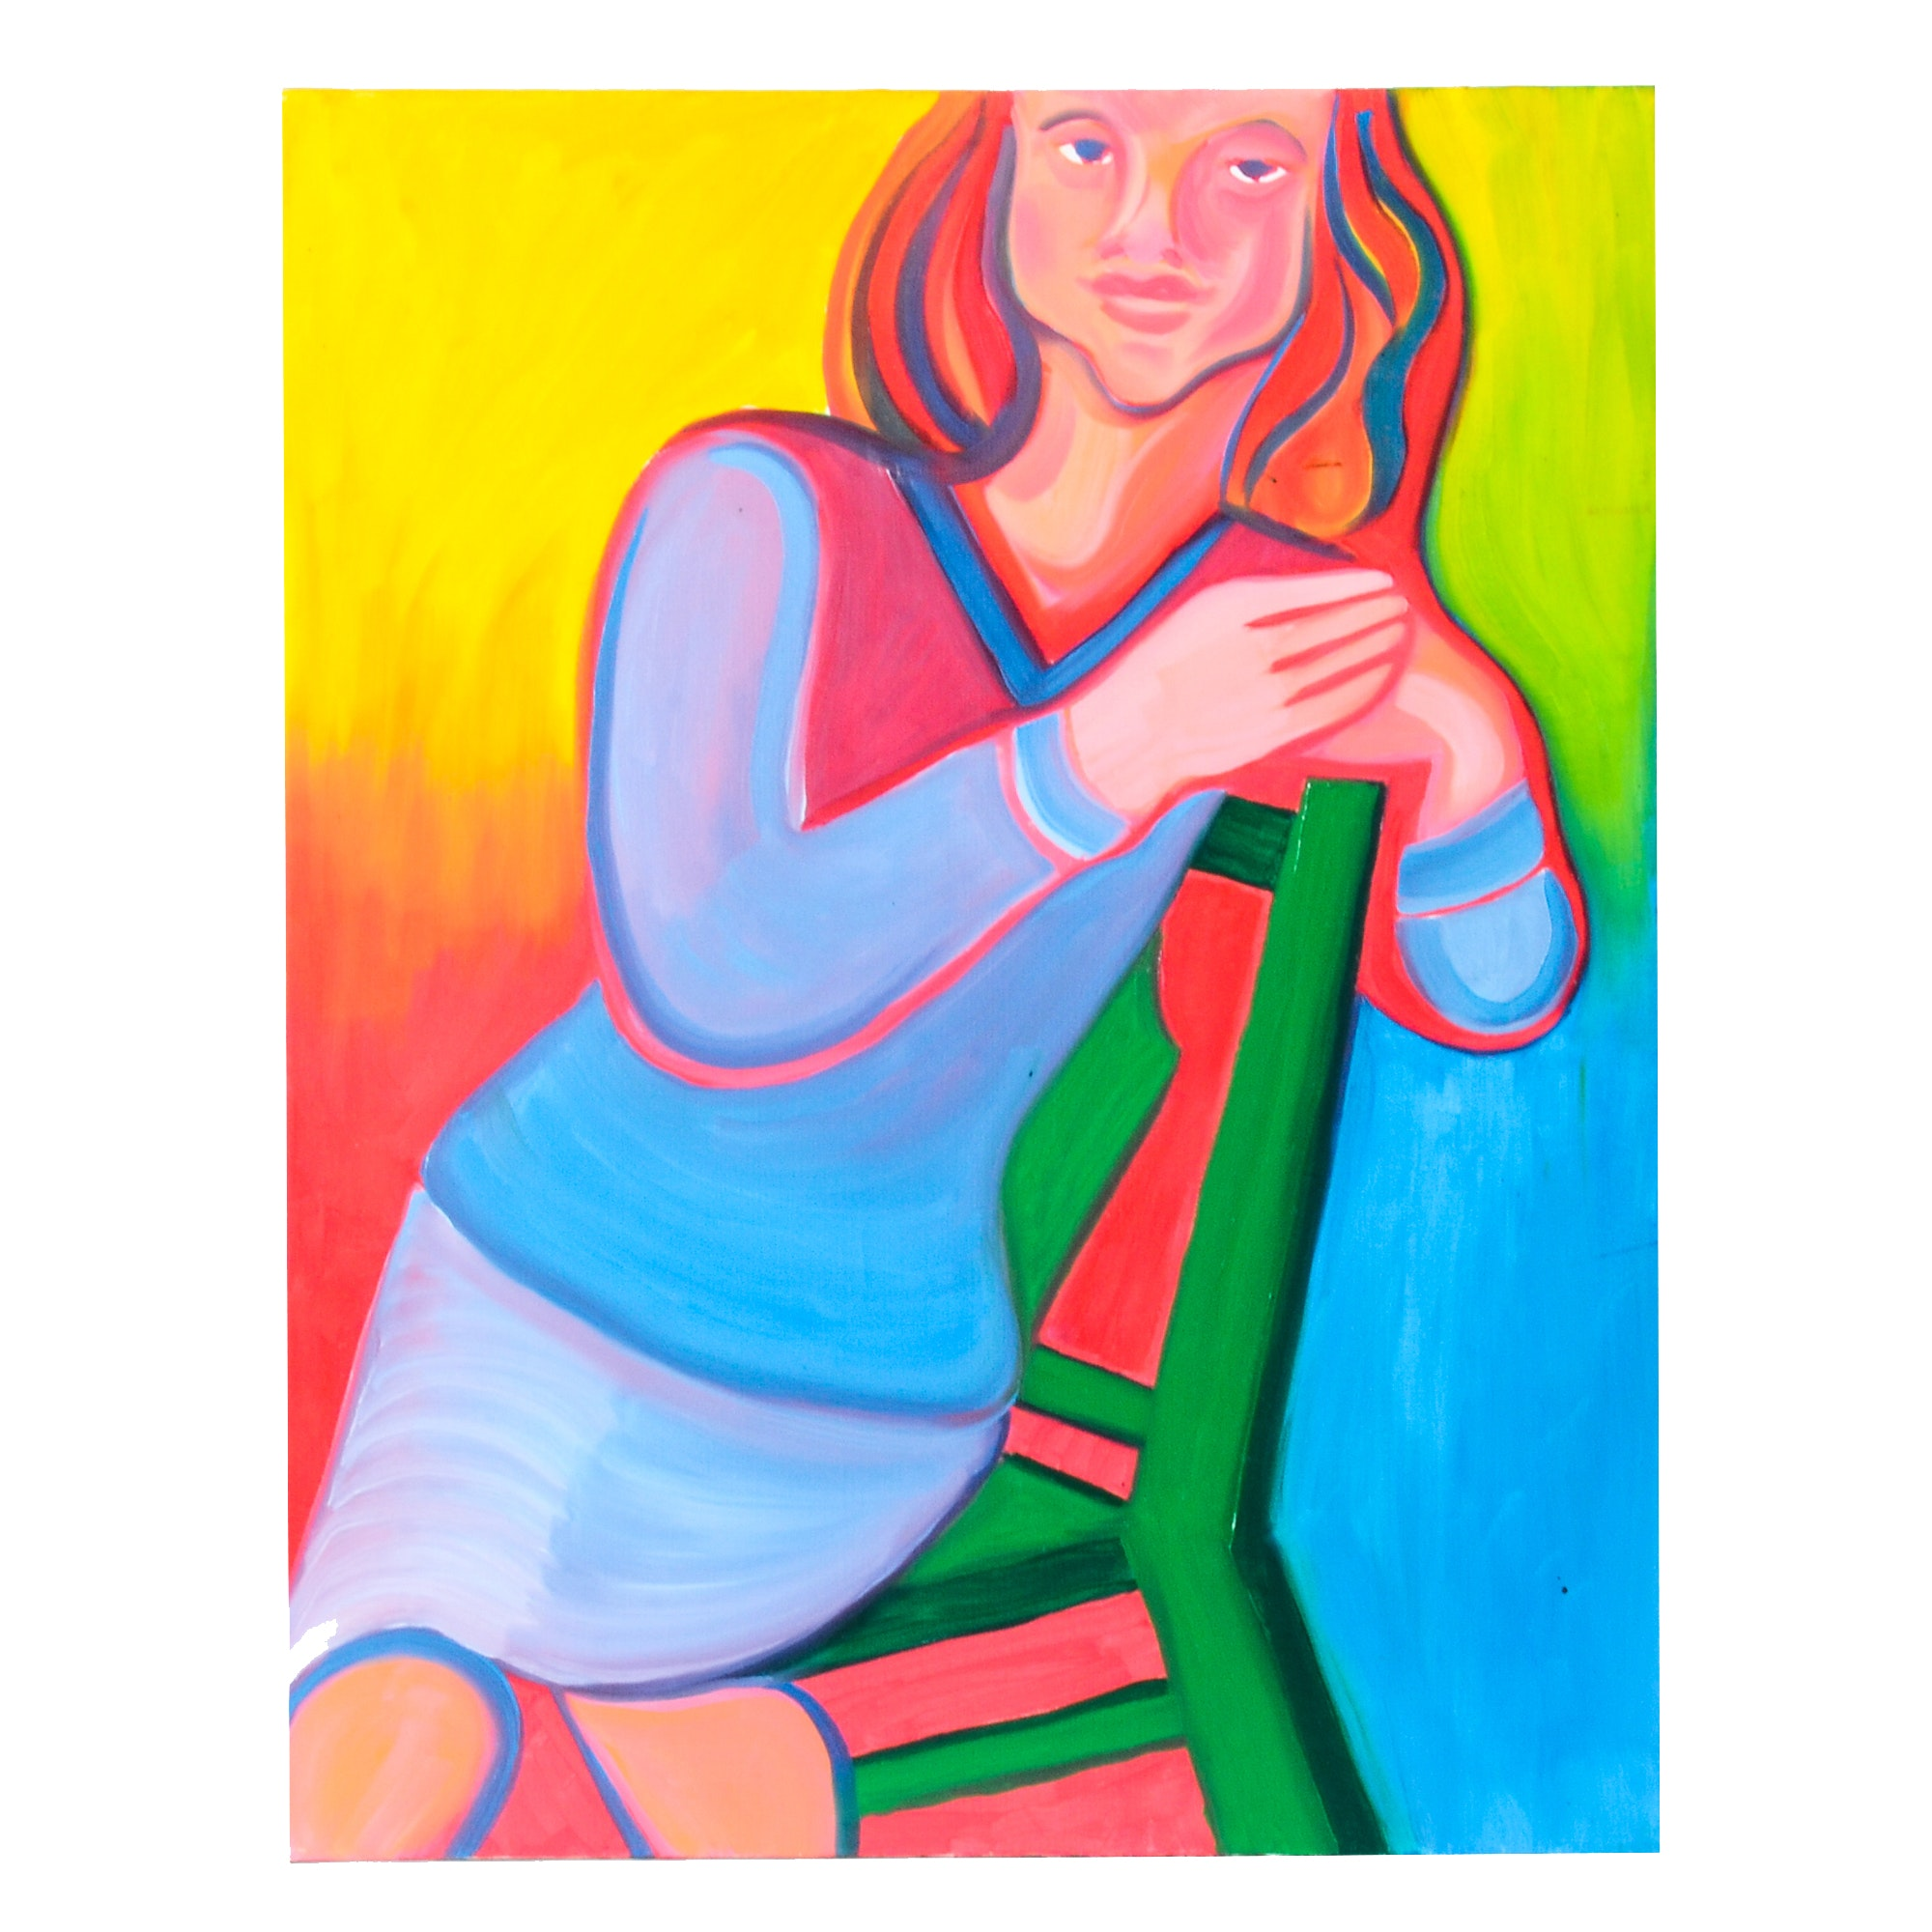 Carol J. Mathews Original Oil on Canvas Portrait Painting